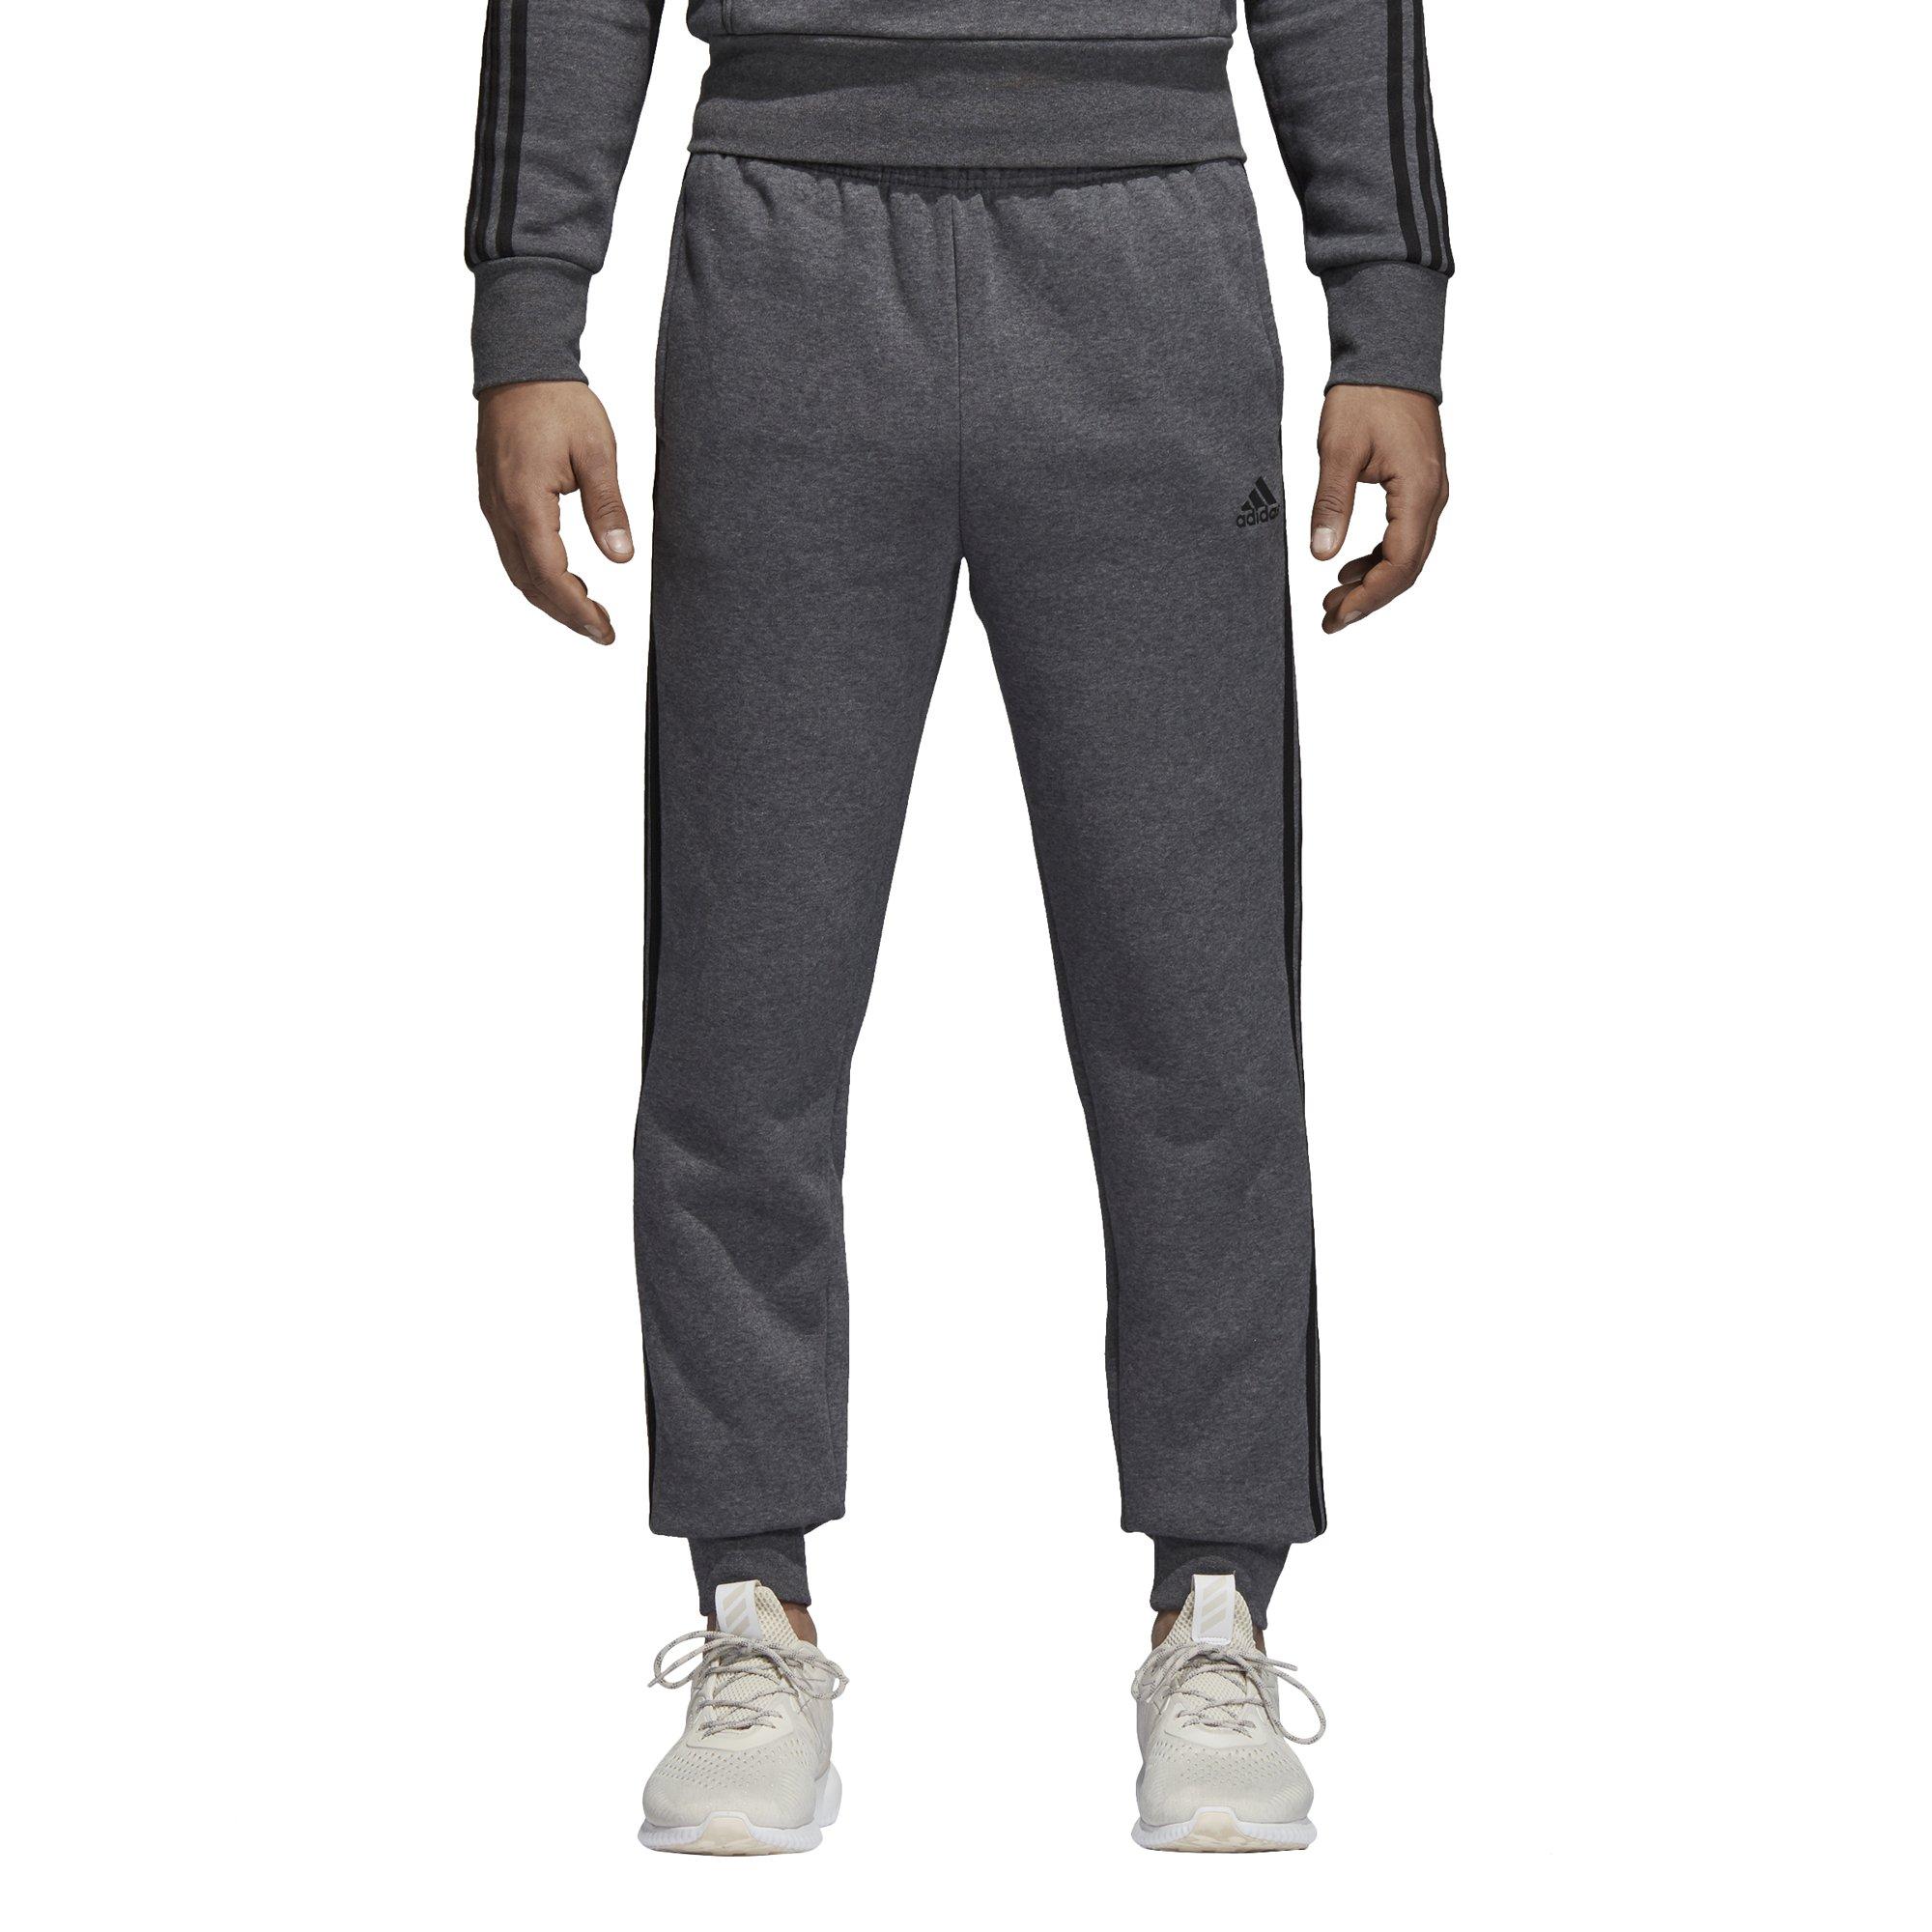 adidas Men's Essentials 3-Stripe Jogger Pants, Dark Grey Heather/Black, Small